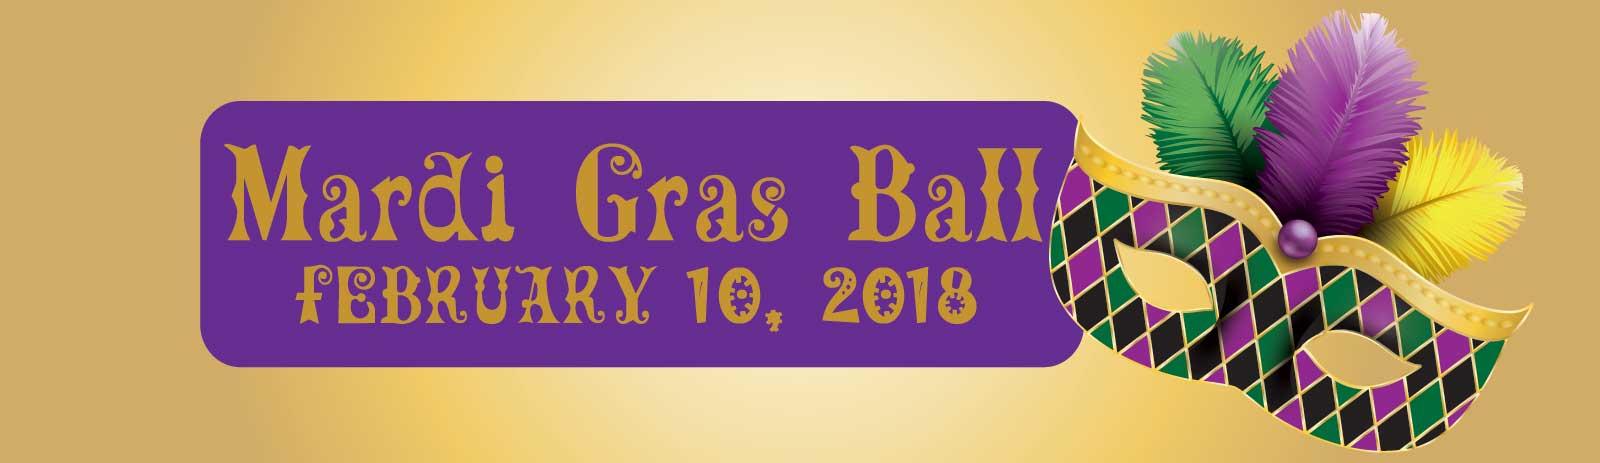 St. Katharine Drexel Mission - 2018 Mardi Gras Ball